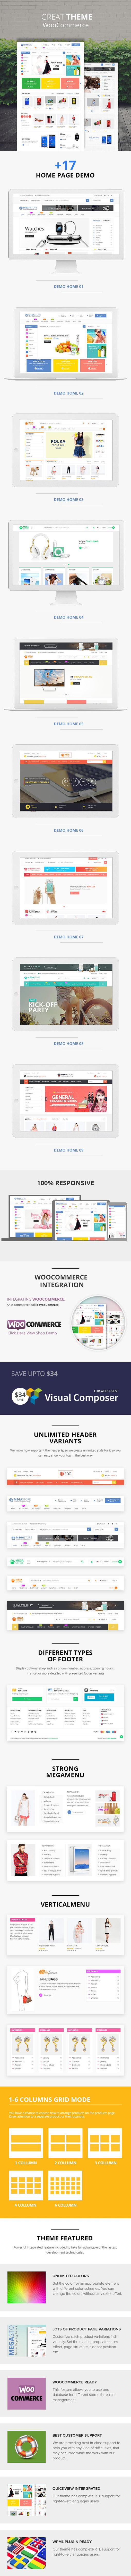 Mega Store - Super Market RTL Responsive WooCommerce WordPress Theme - 4